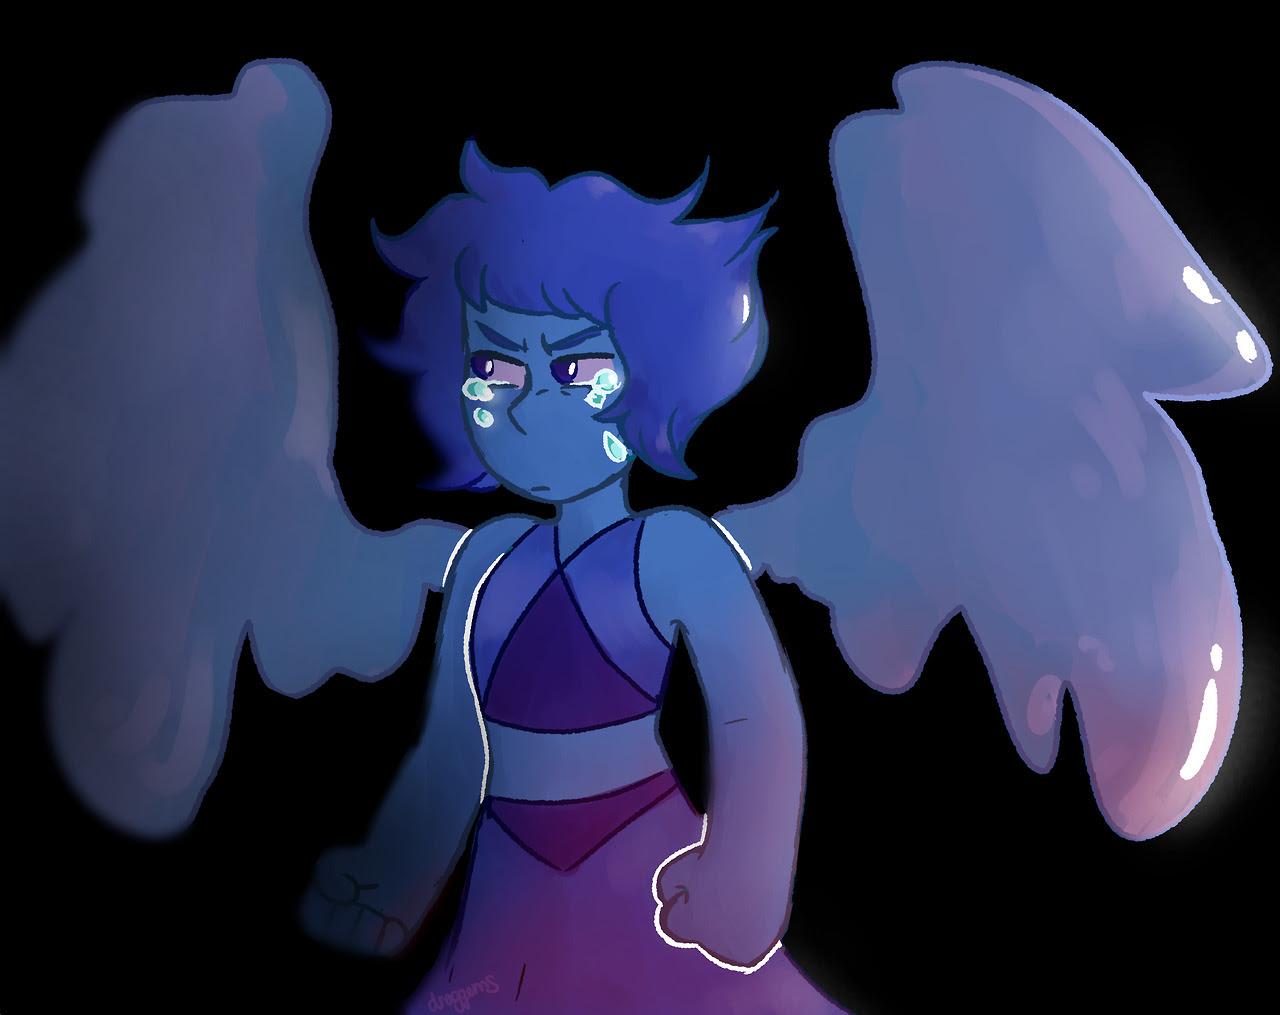 angery